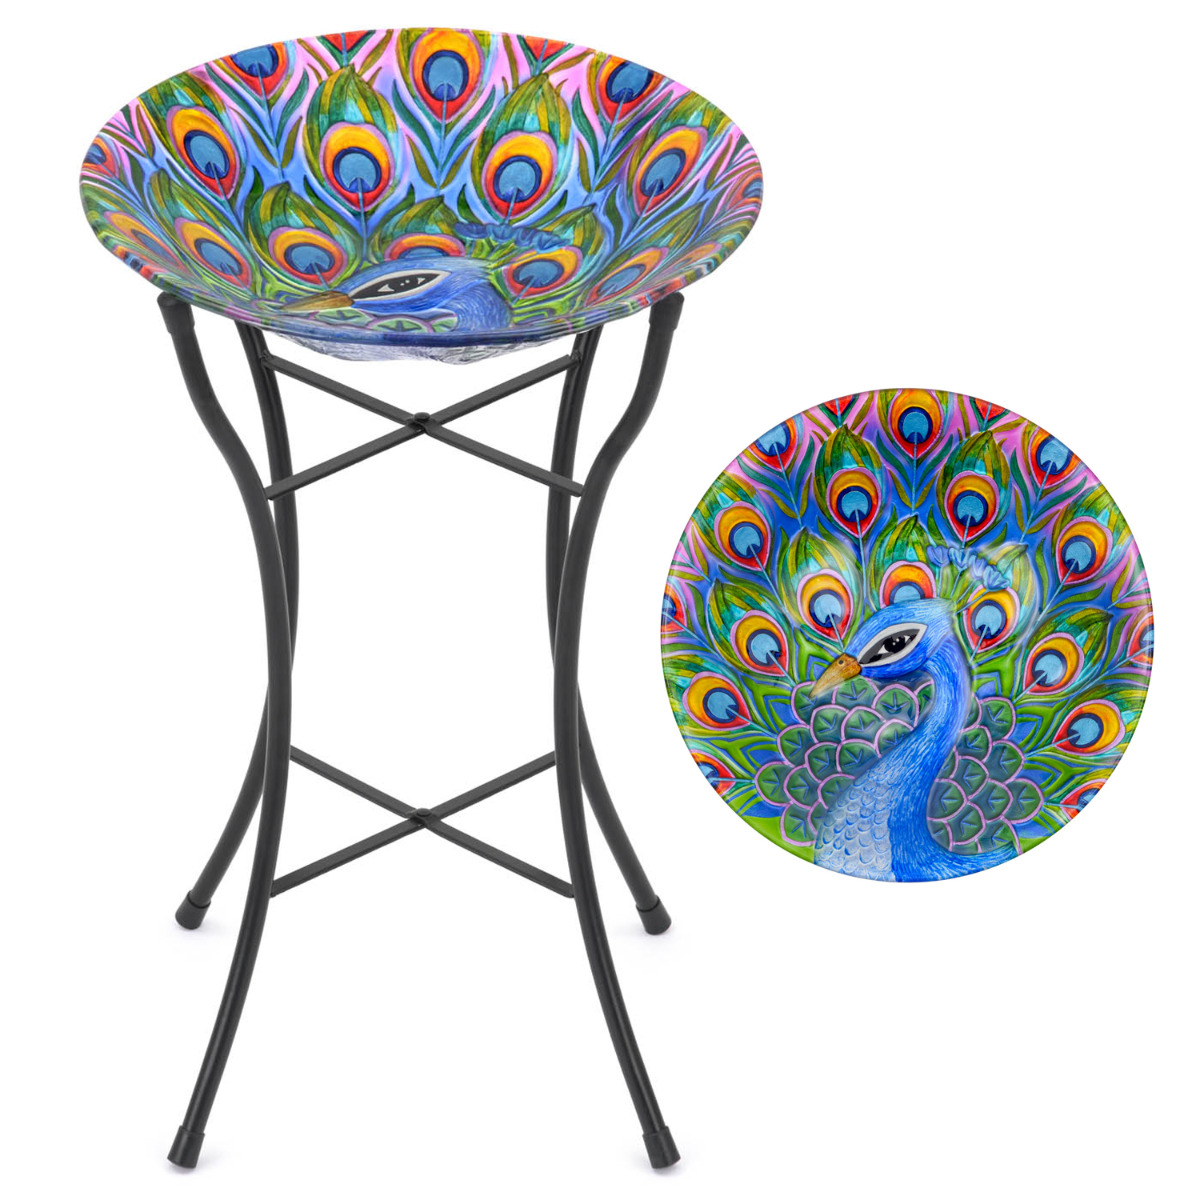 Image of Glass Peacock Bird Bath